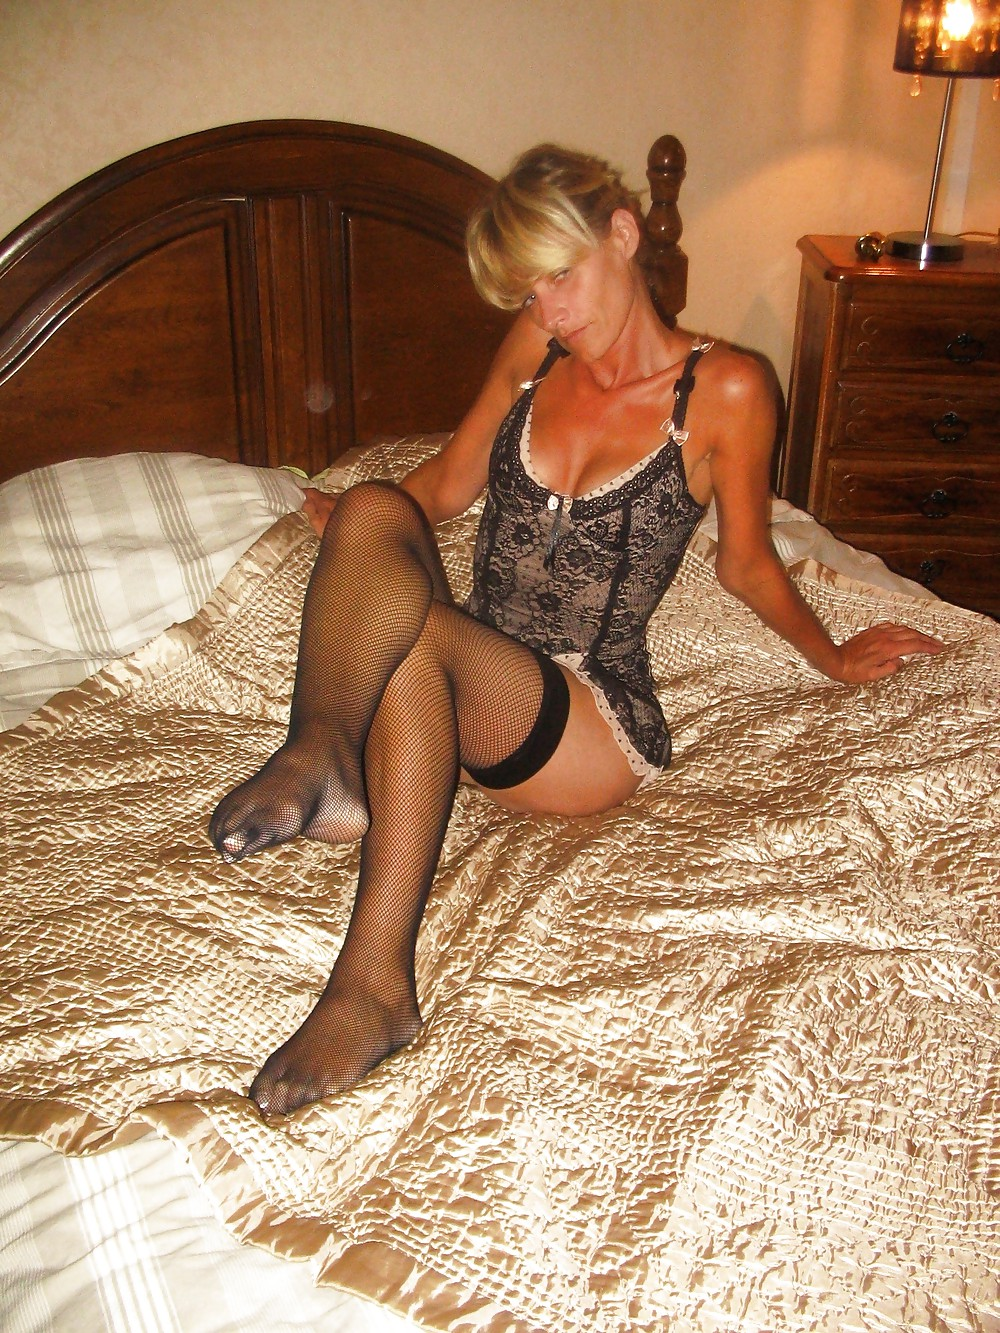 Порно фото зрелые с кисками лохматыми пусть